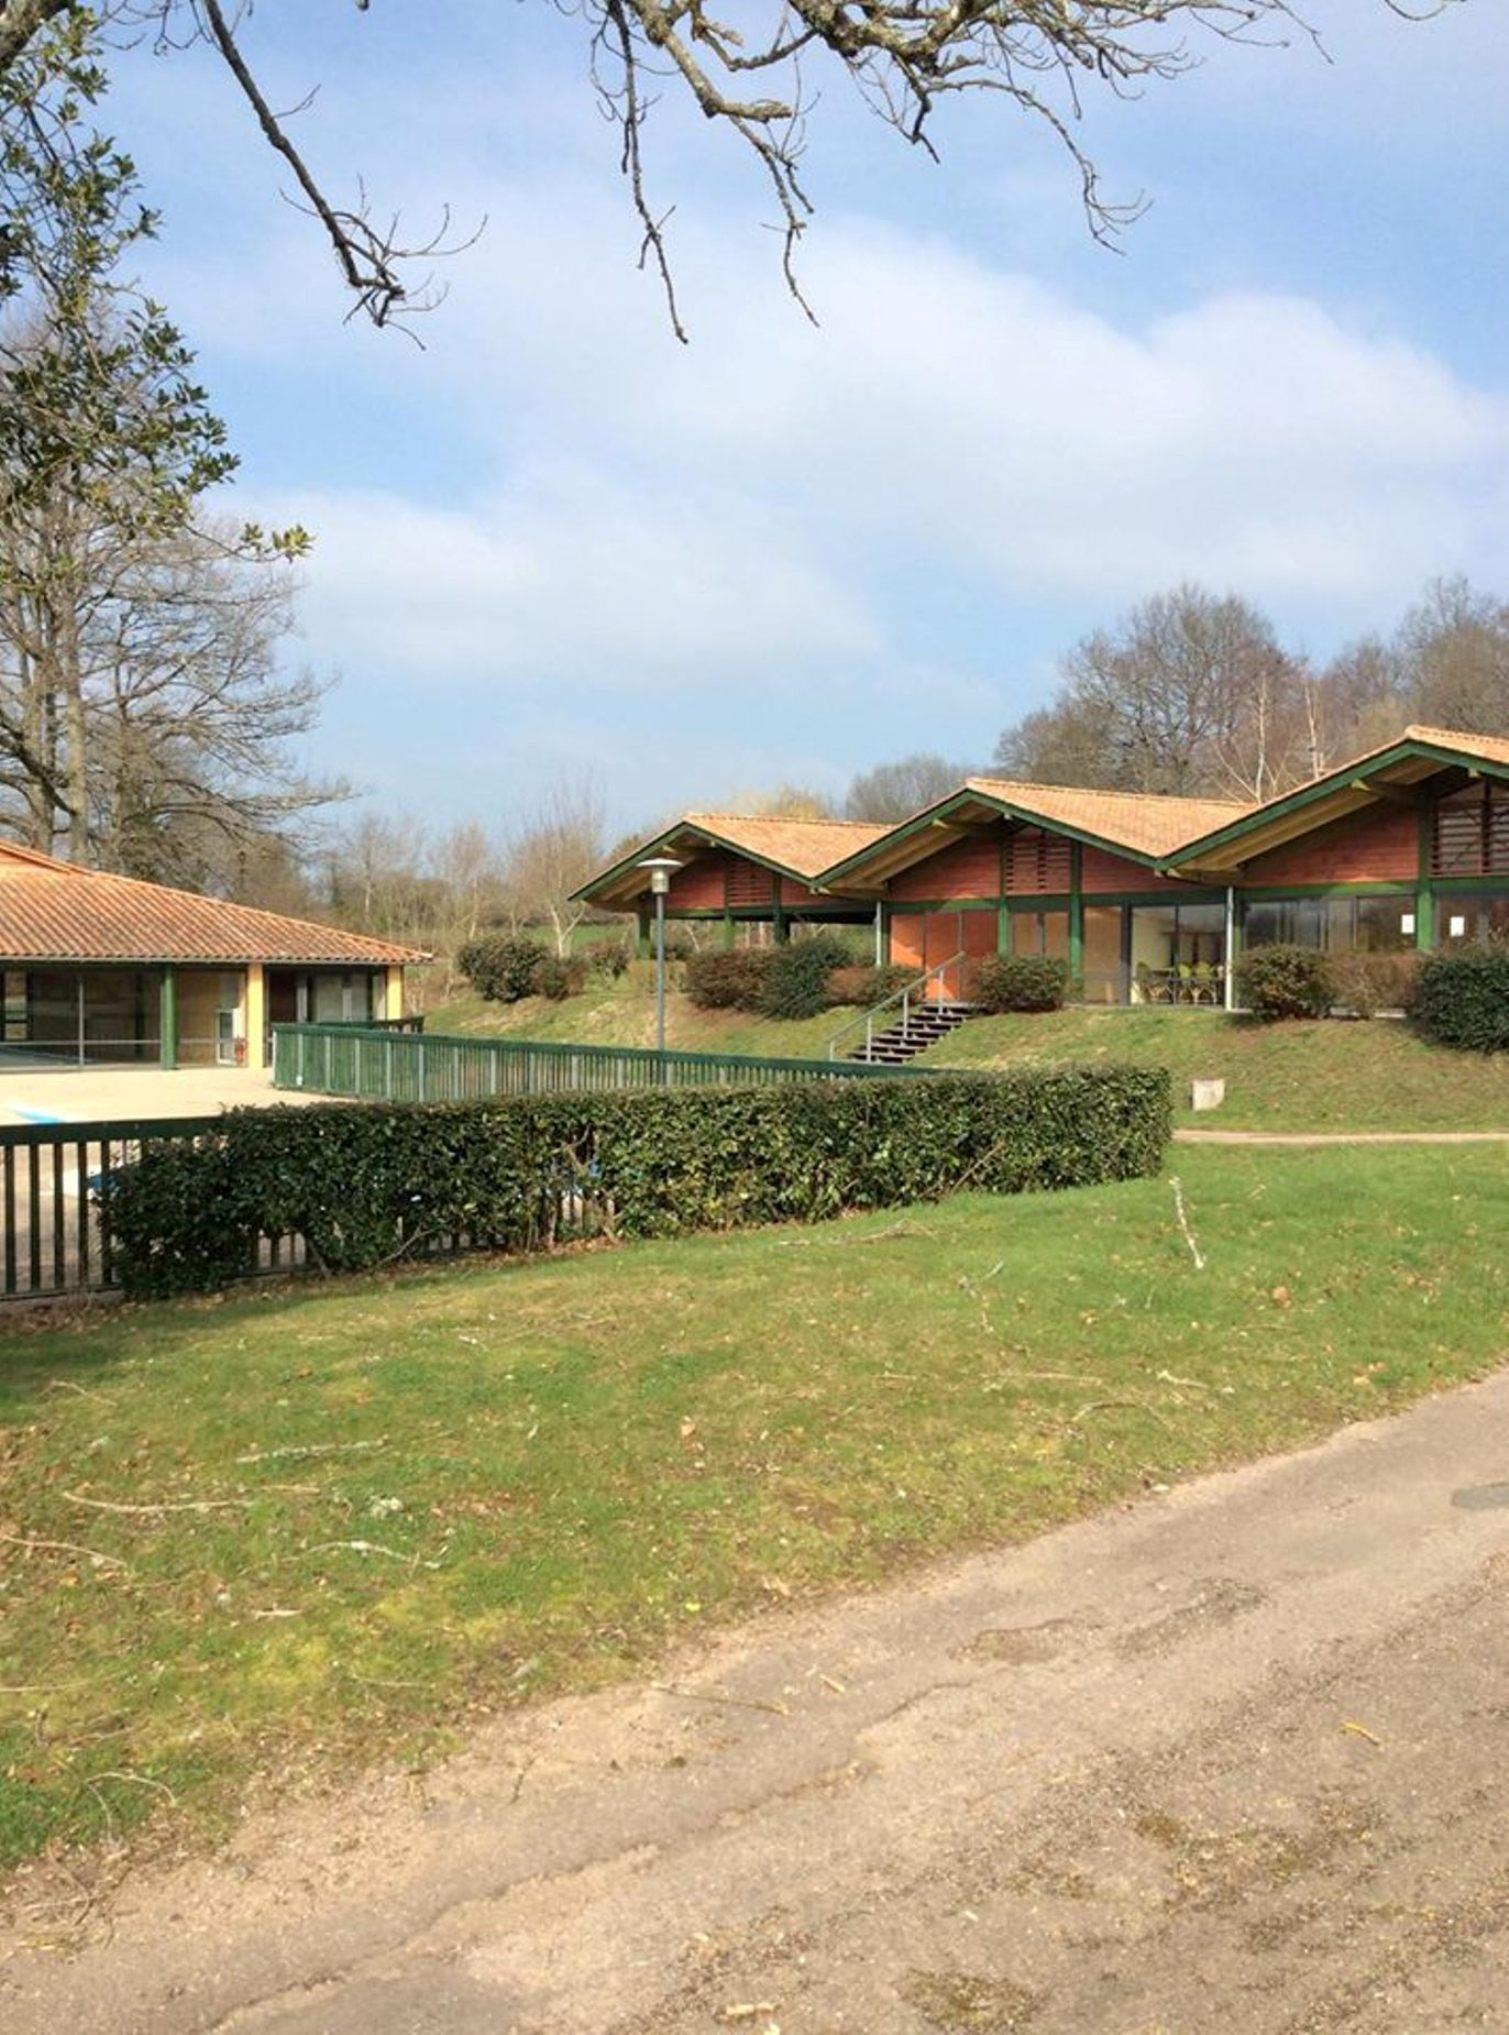 Camping des Lacs, Pressignac, Charente